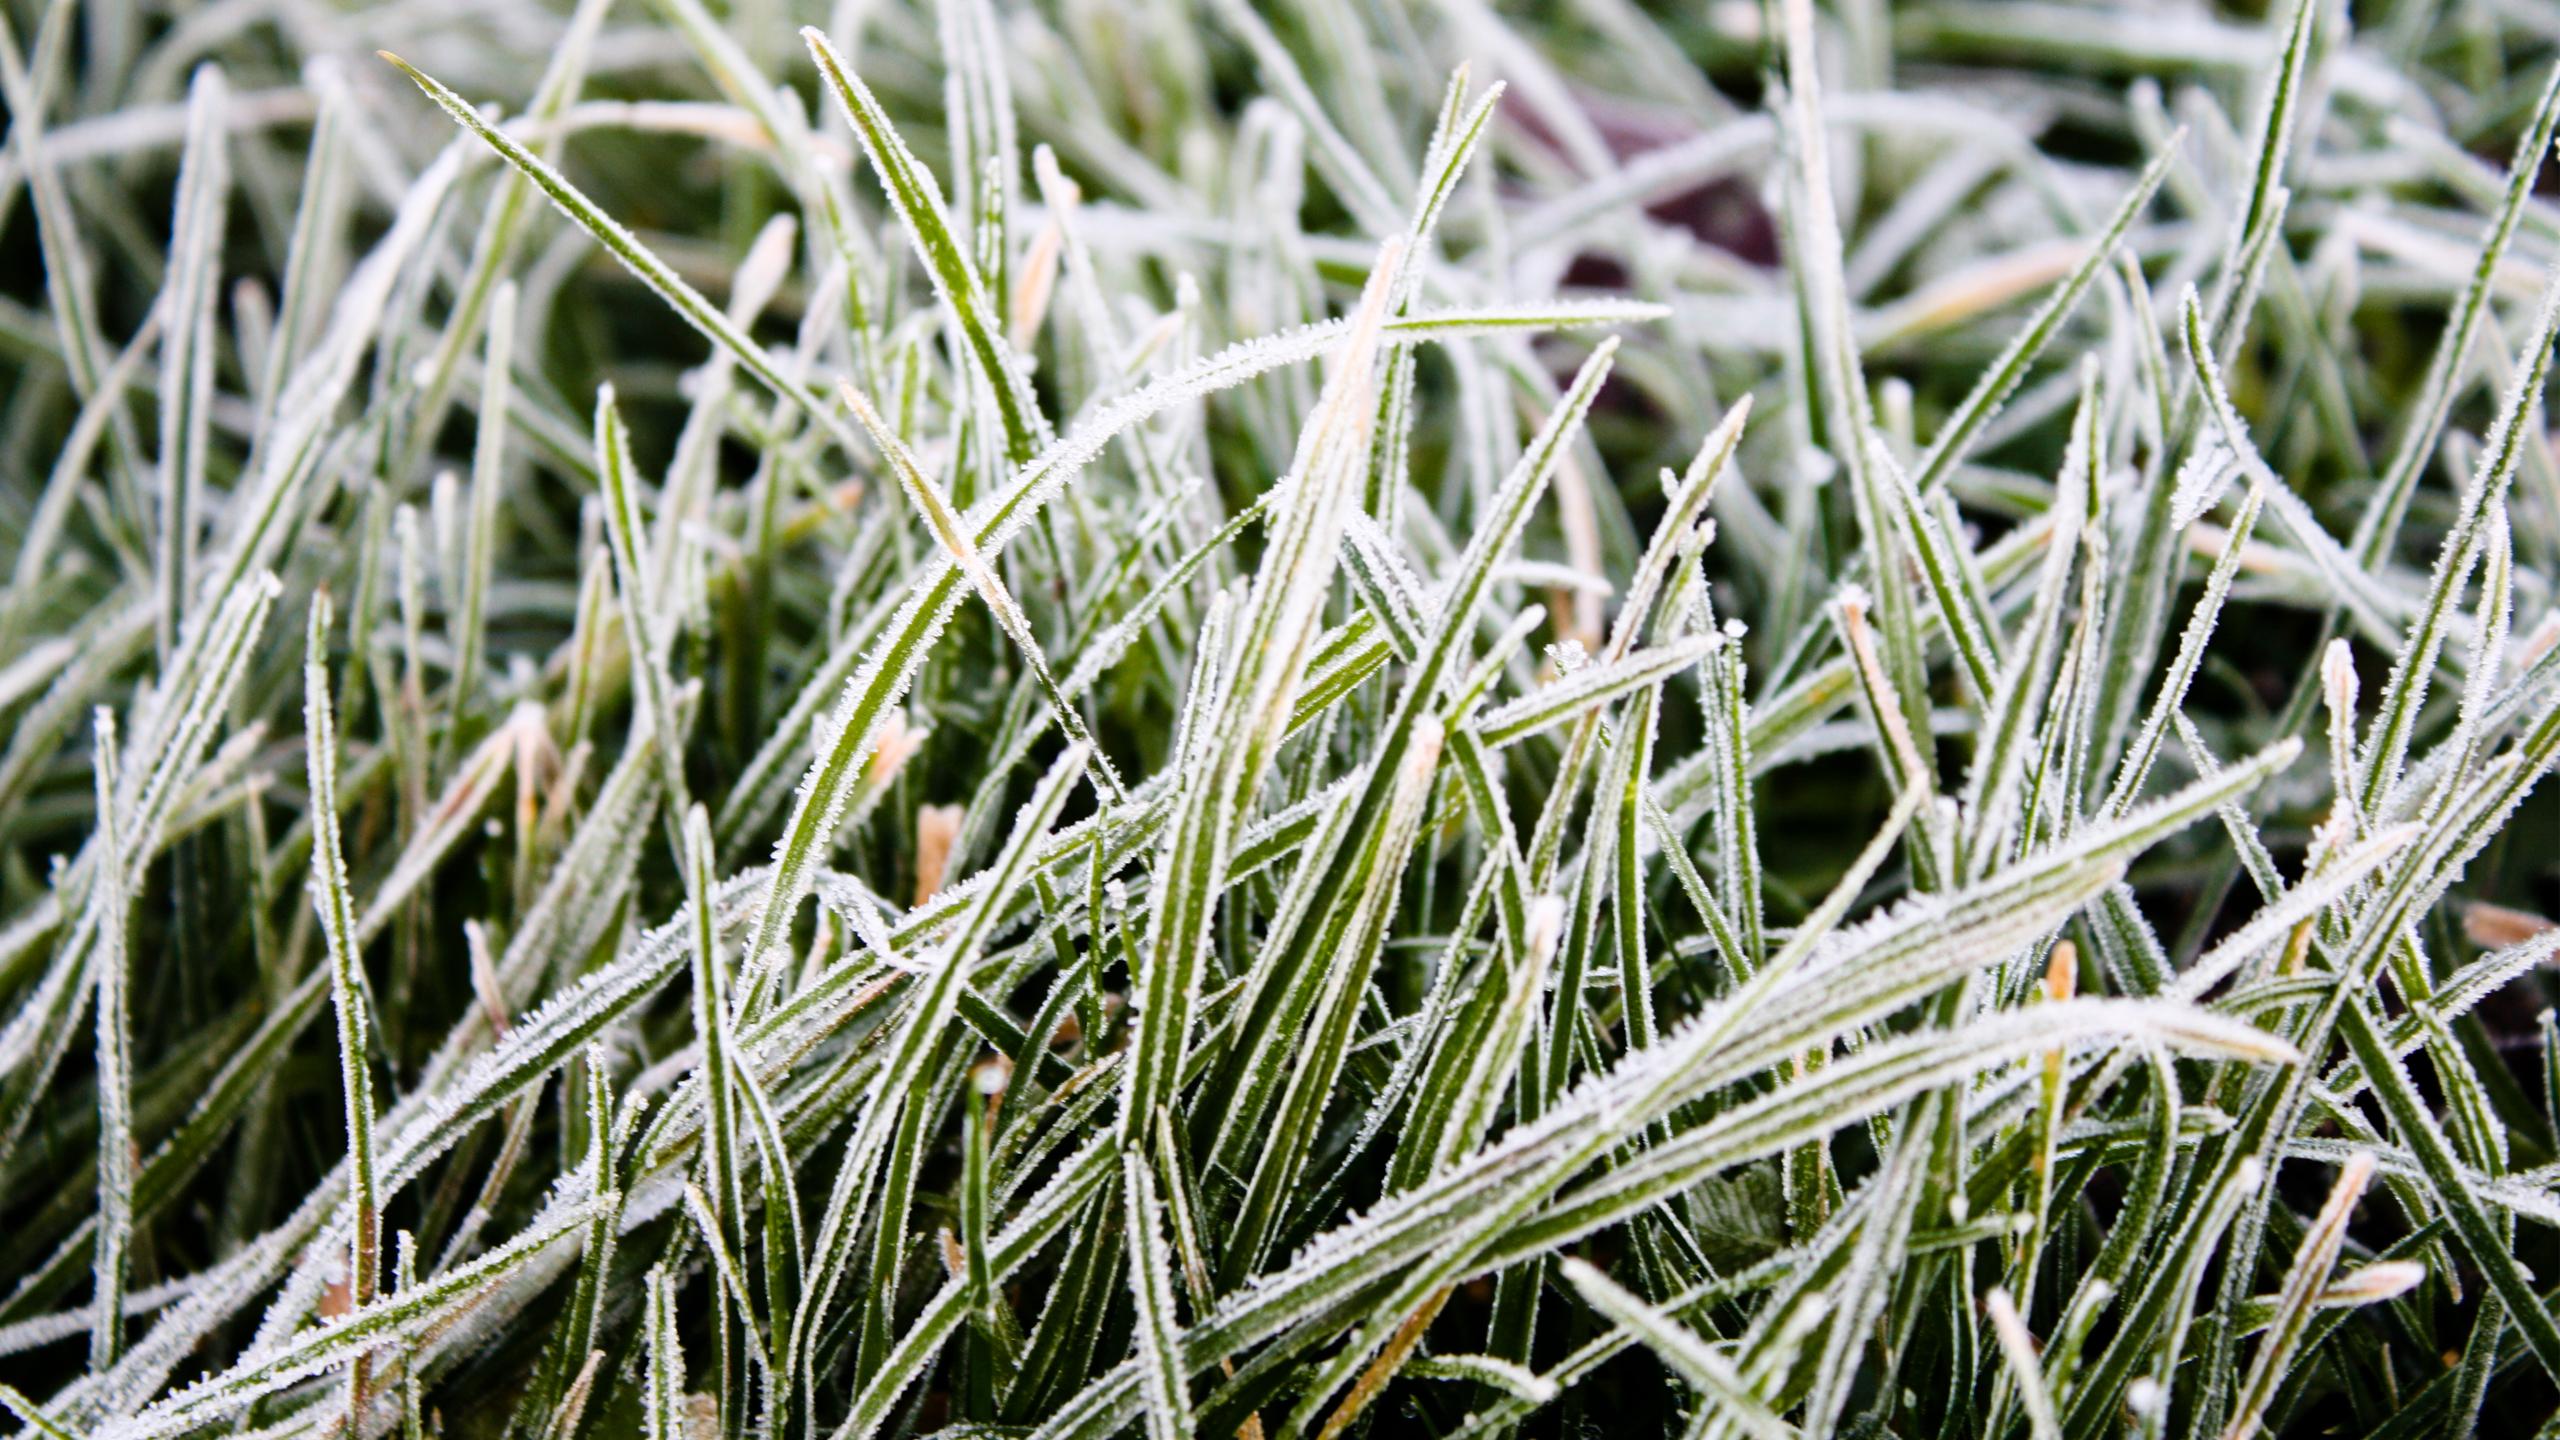 Frozen grass photo